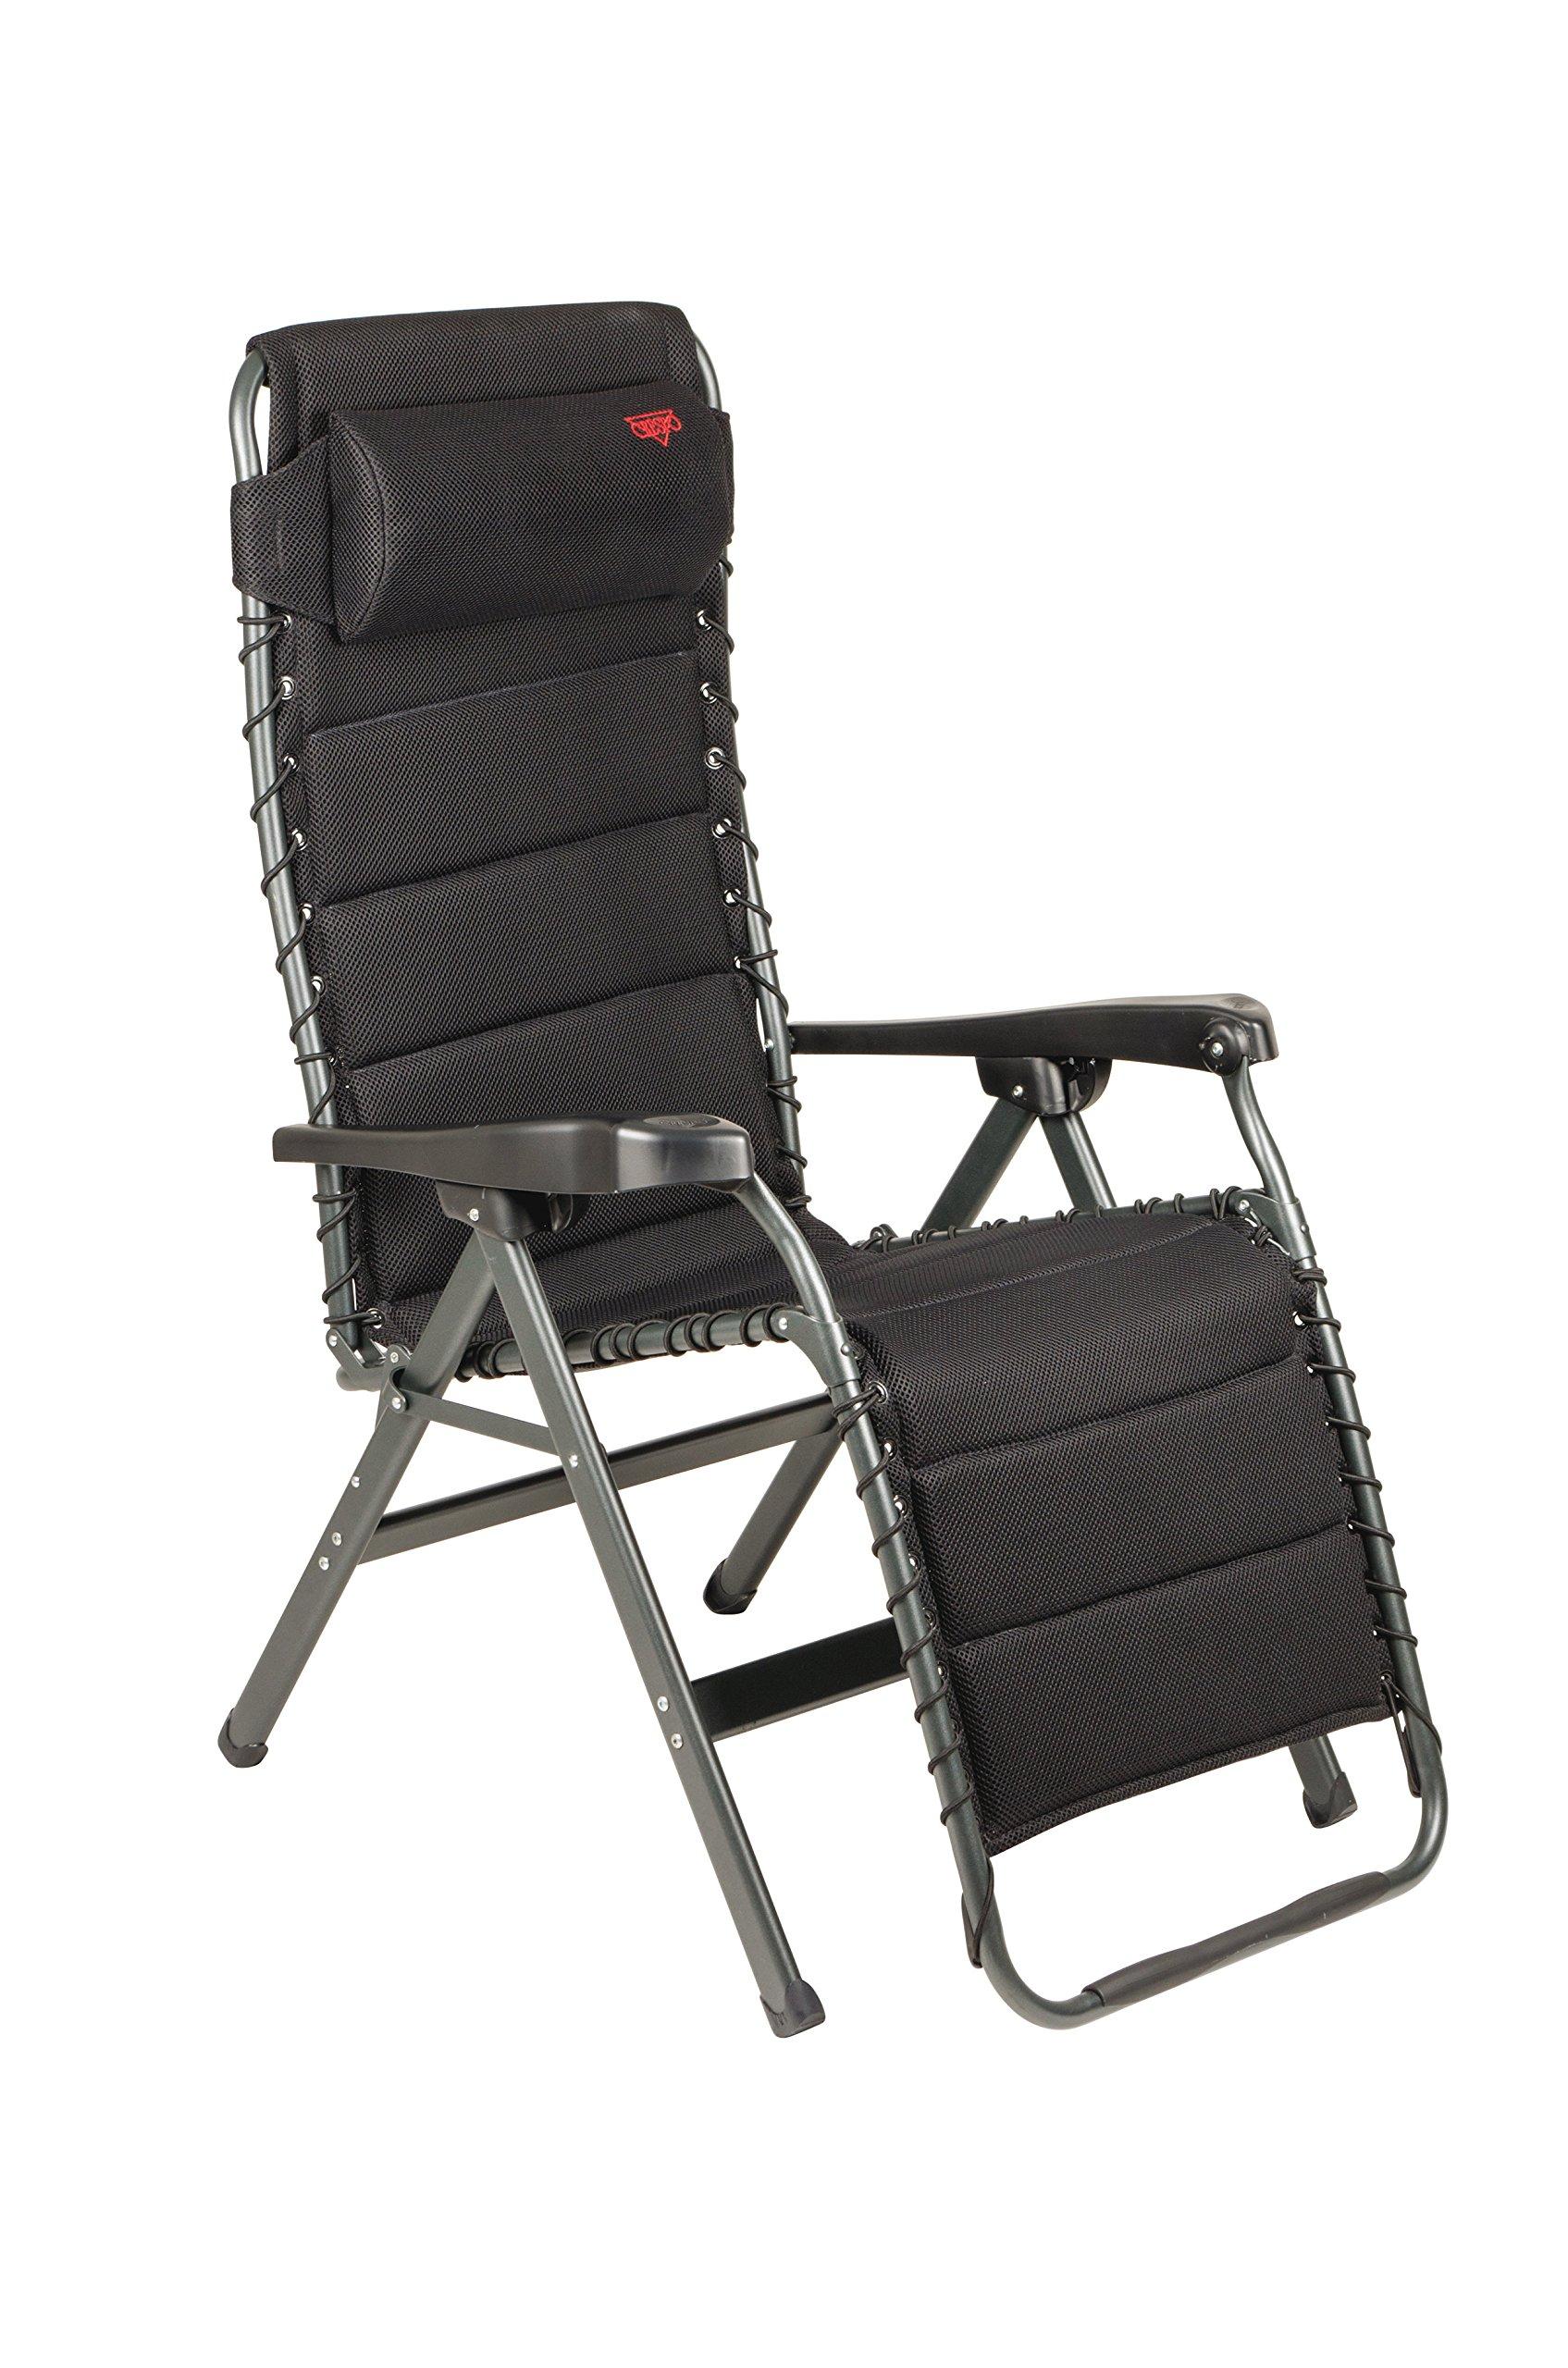 Crespo - Relaxing Chair - AP-232 Air-Deluxe - Black